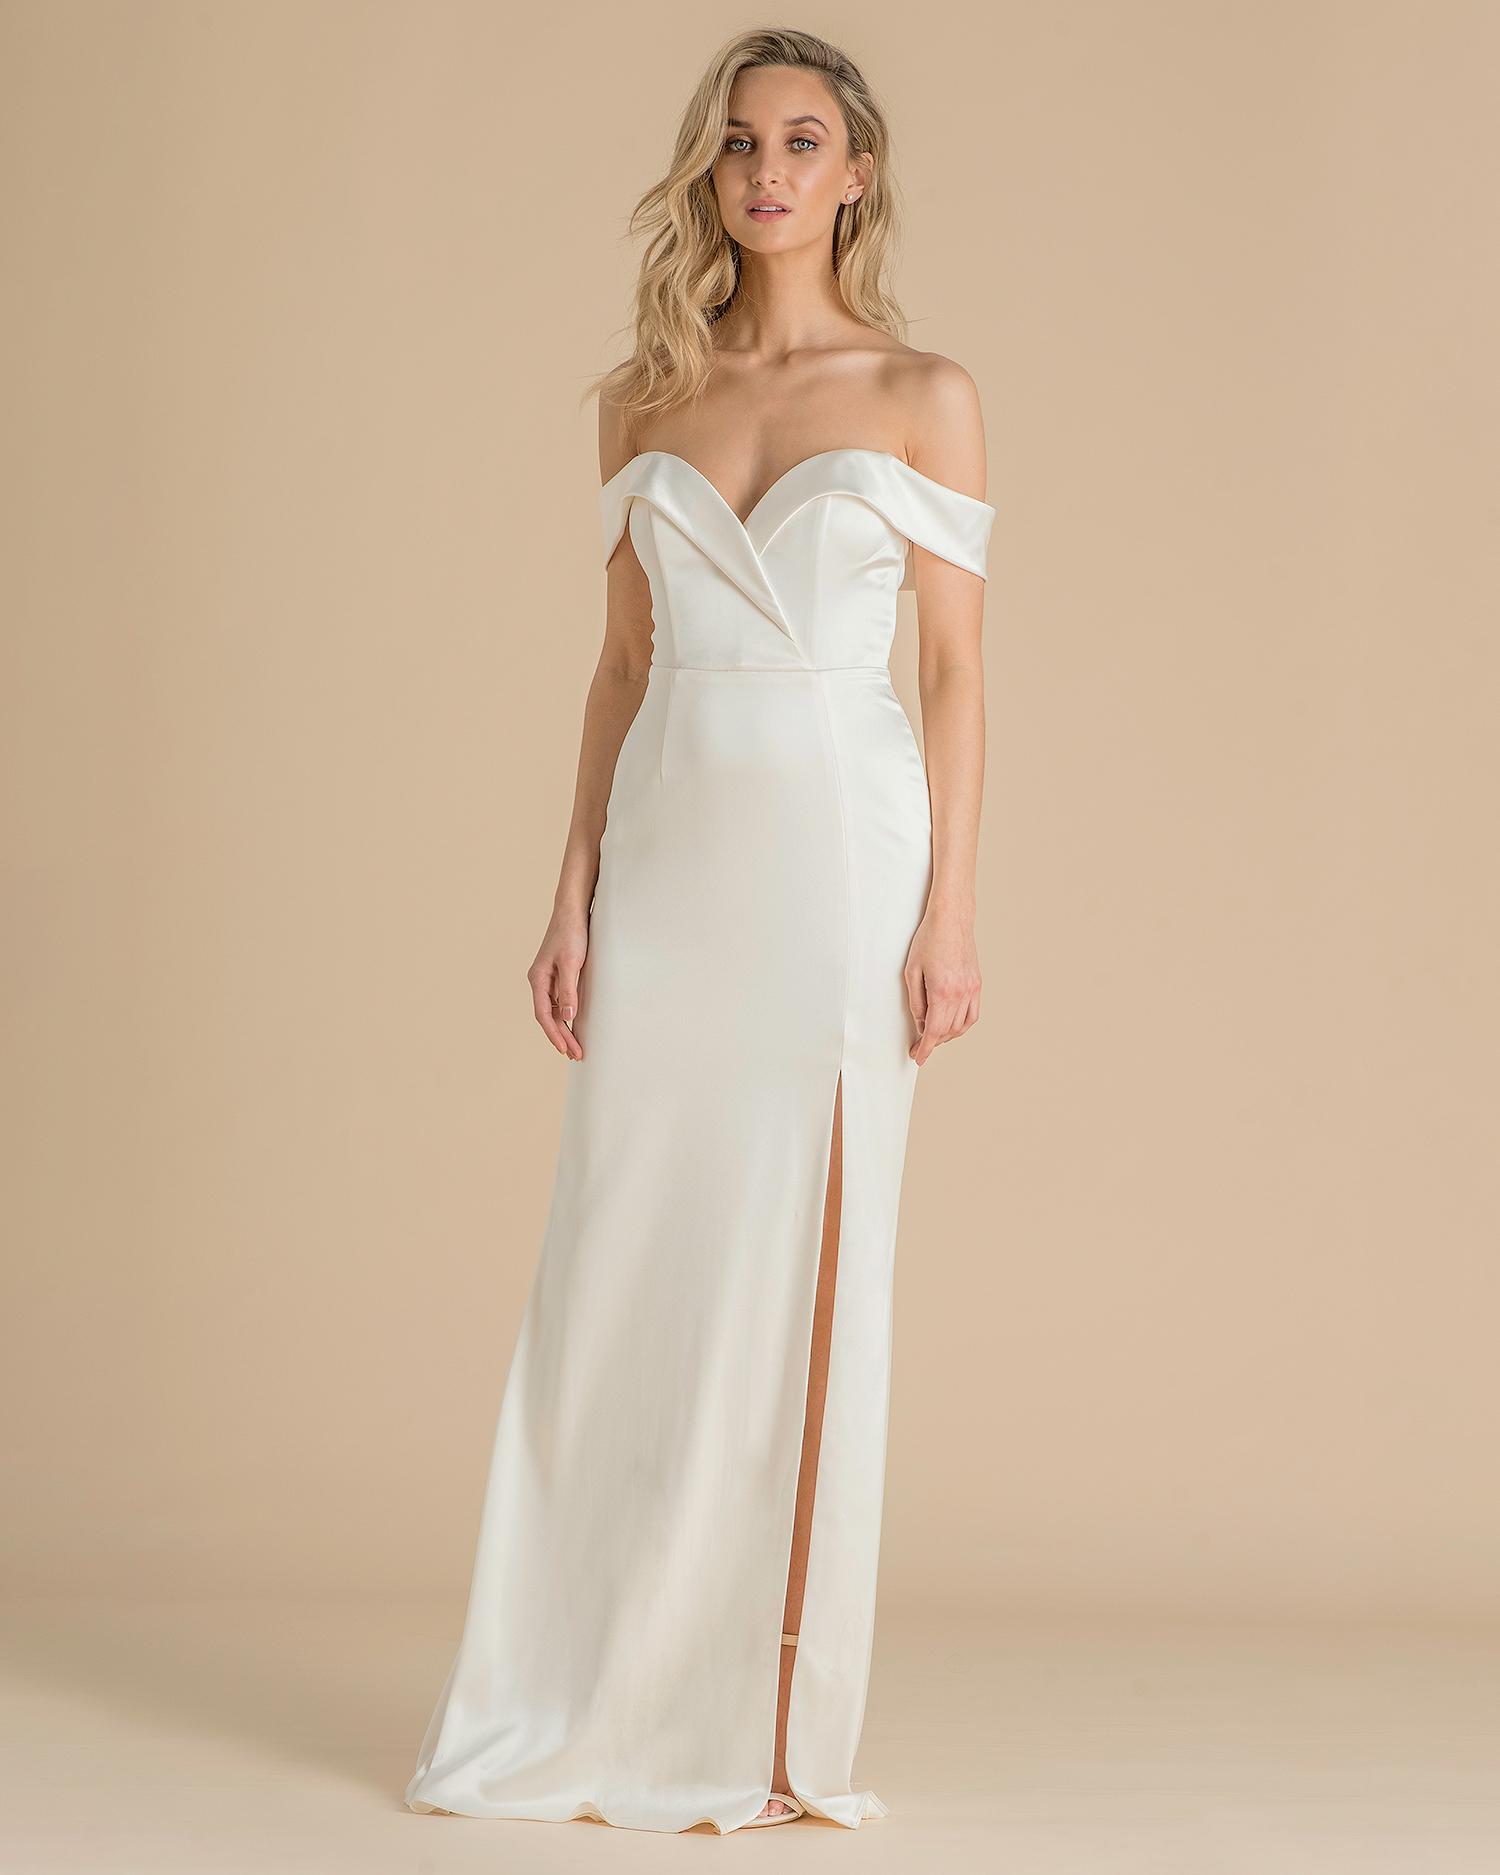 catherine deane wedding dress spring 2019 off-the-shoulder with high slit